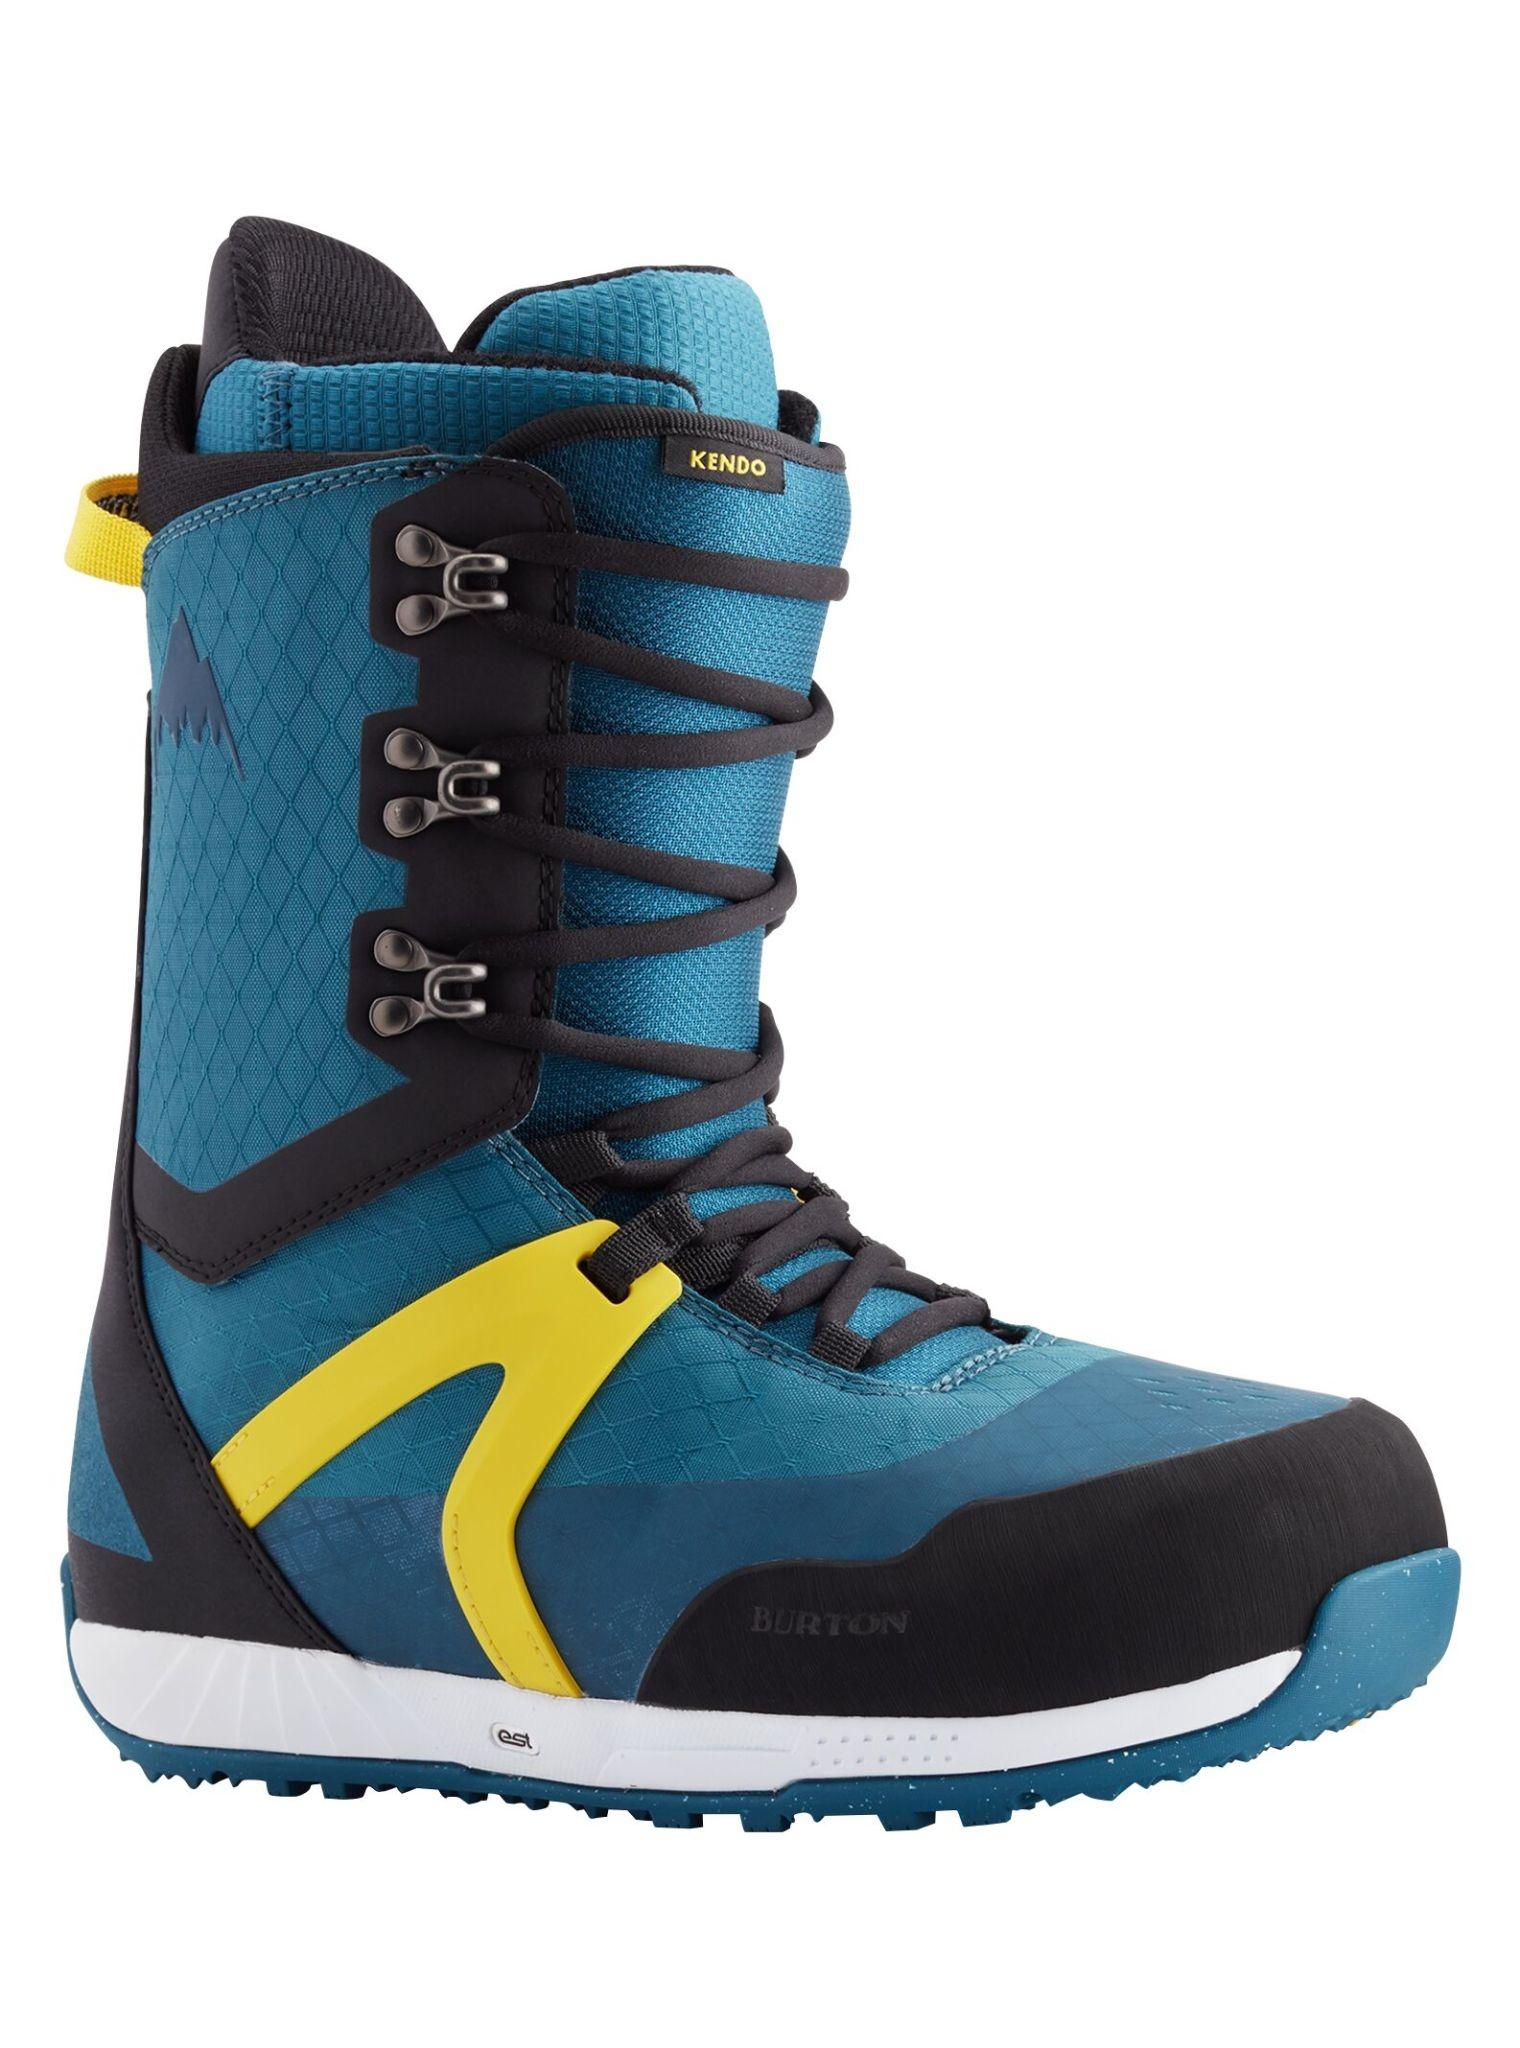 Burton Burton Men's Kendo Snowboard Boot (2021)